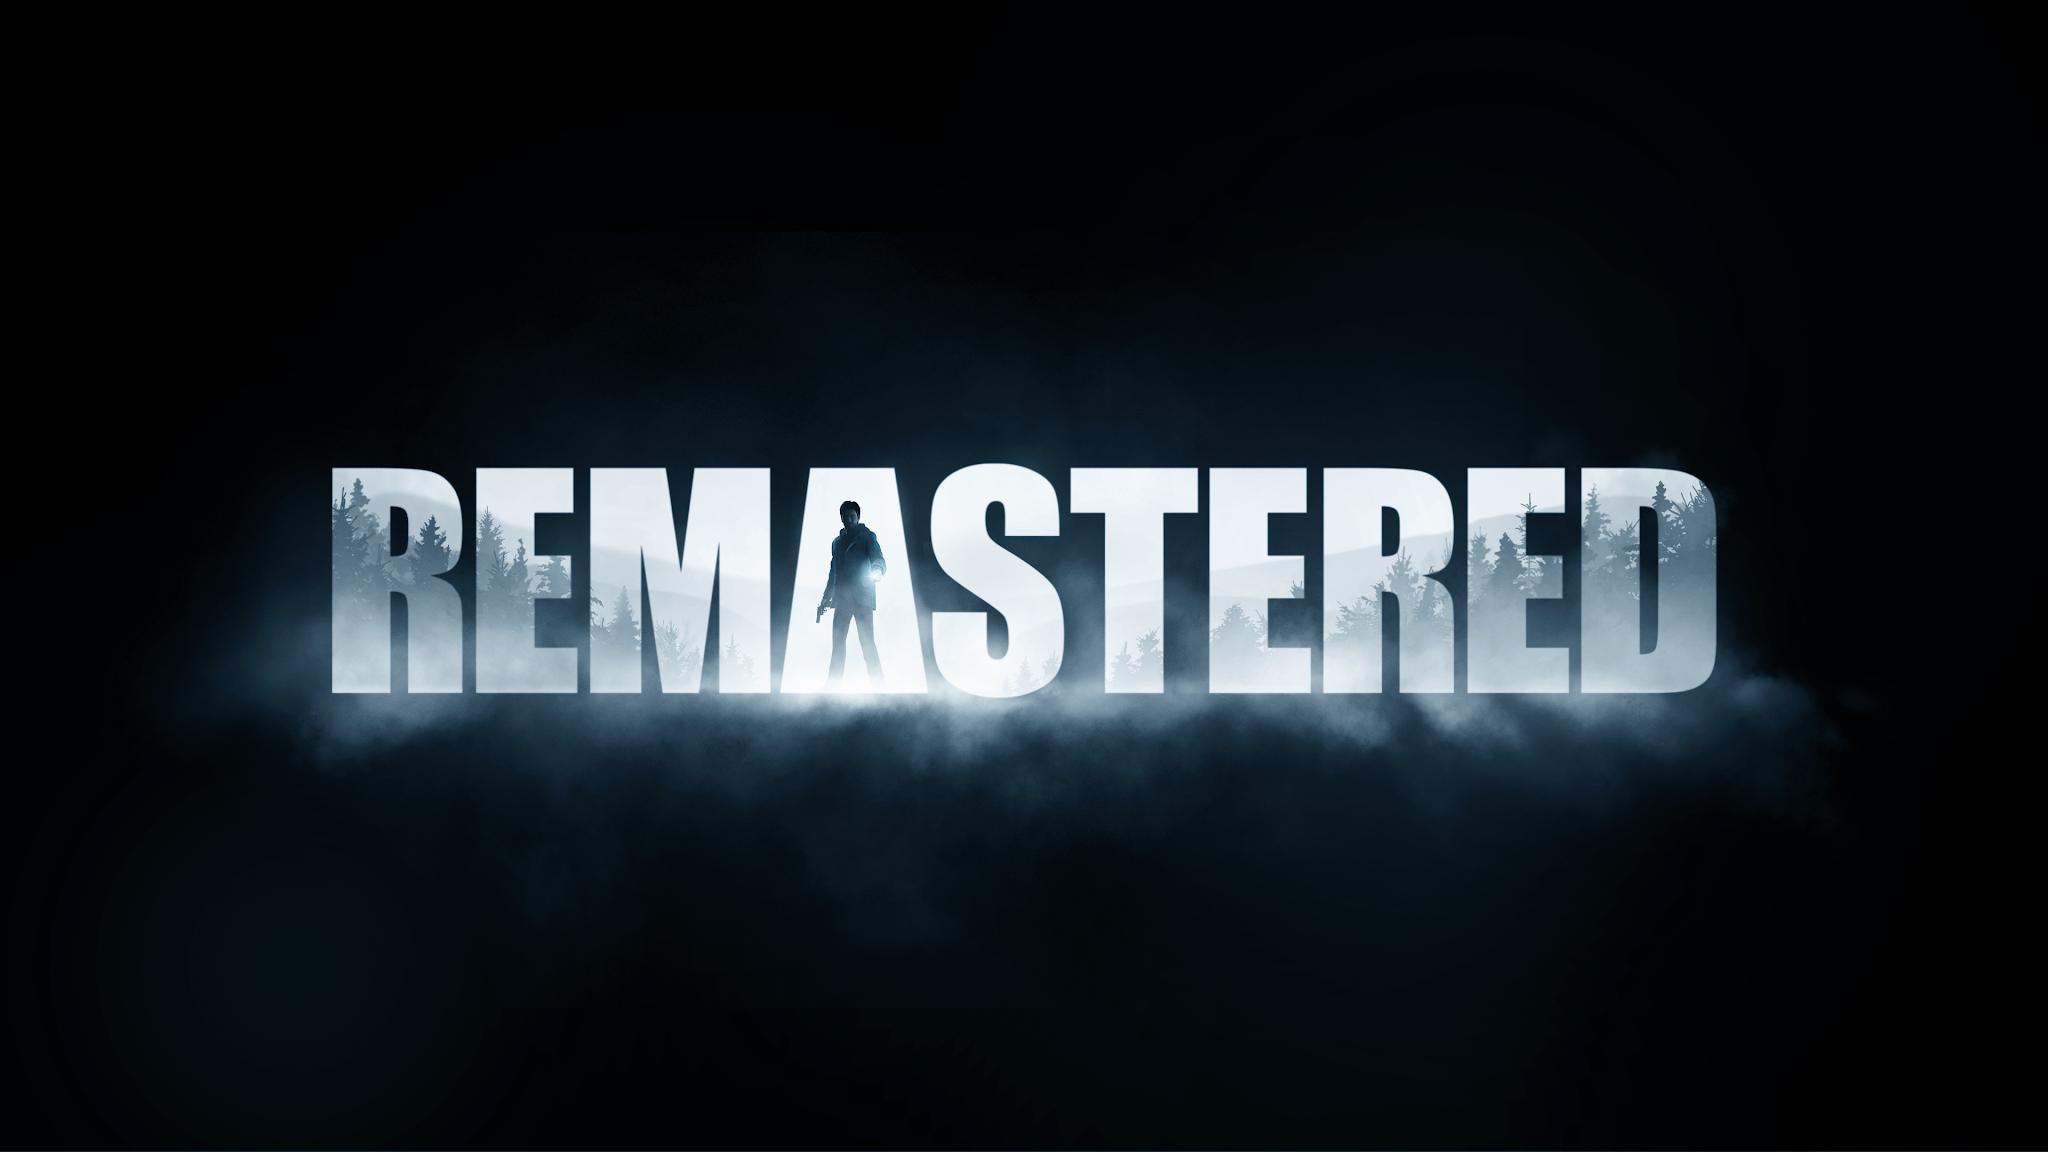 AlanWakeRemastered1